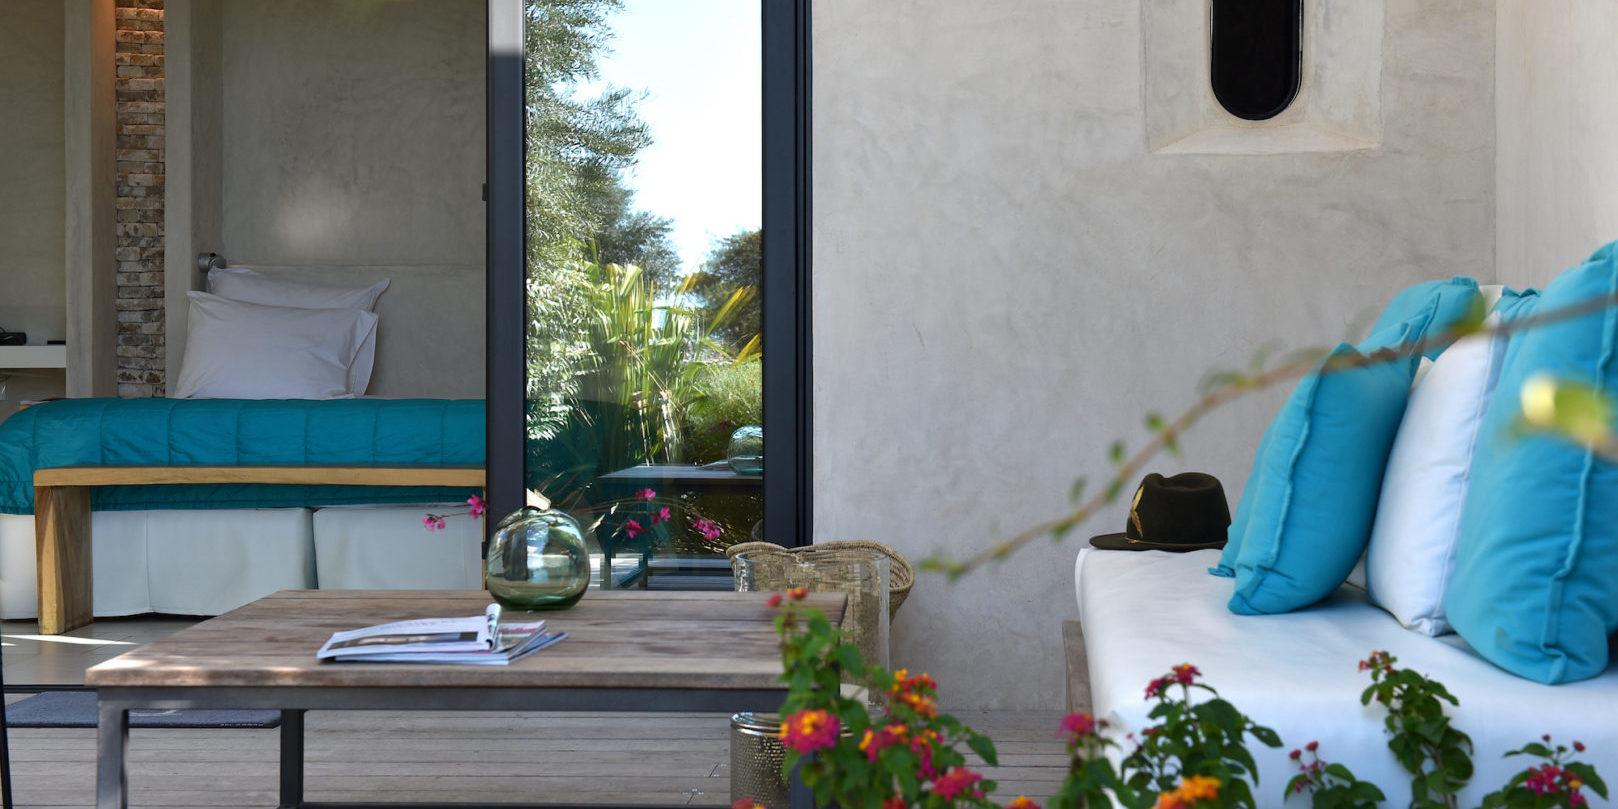 Hotel Cala di Greco Bonifacio Corsica Zuid-Corsica Frankrijk suite terras loungebed